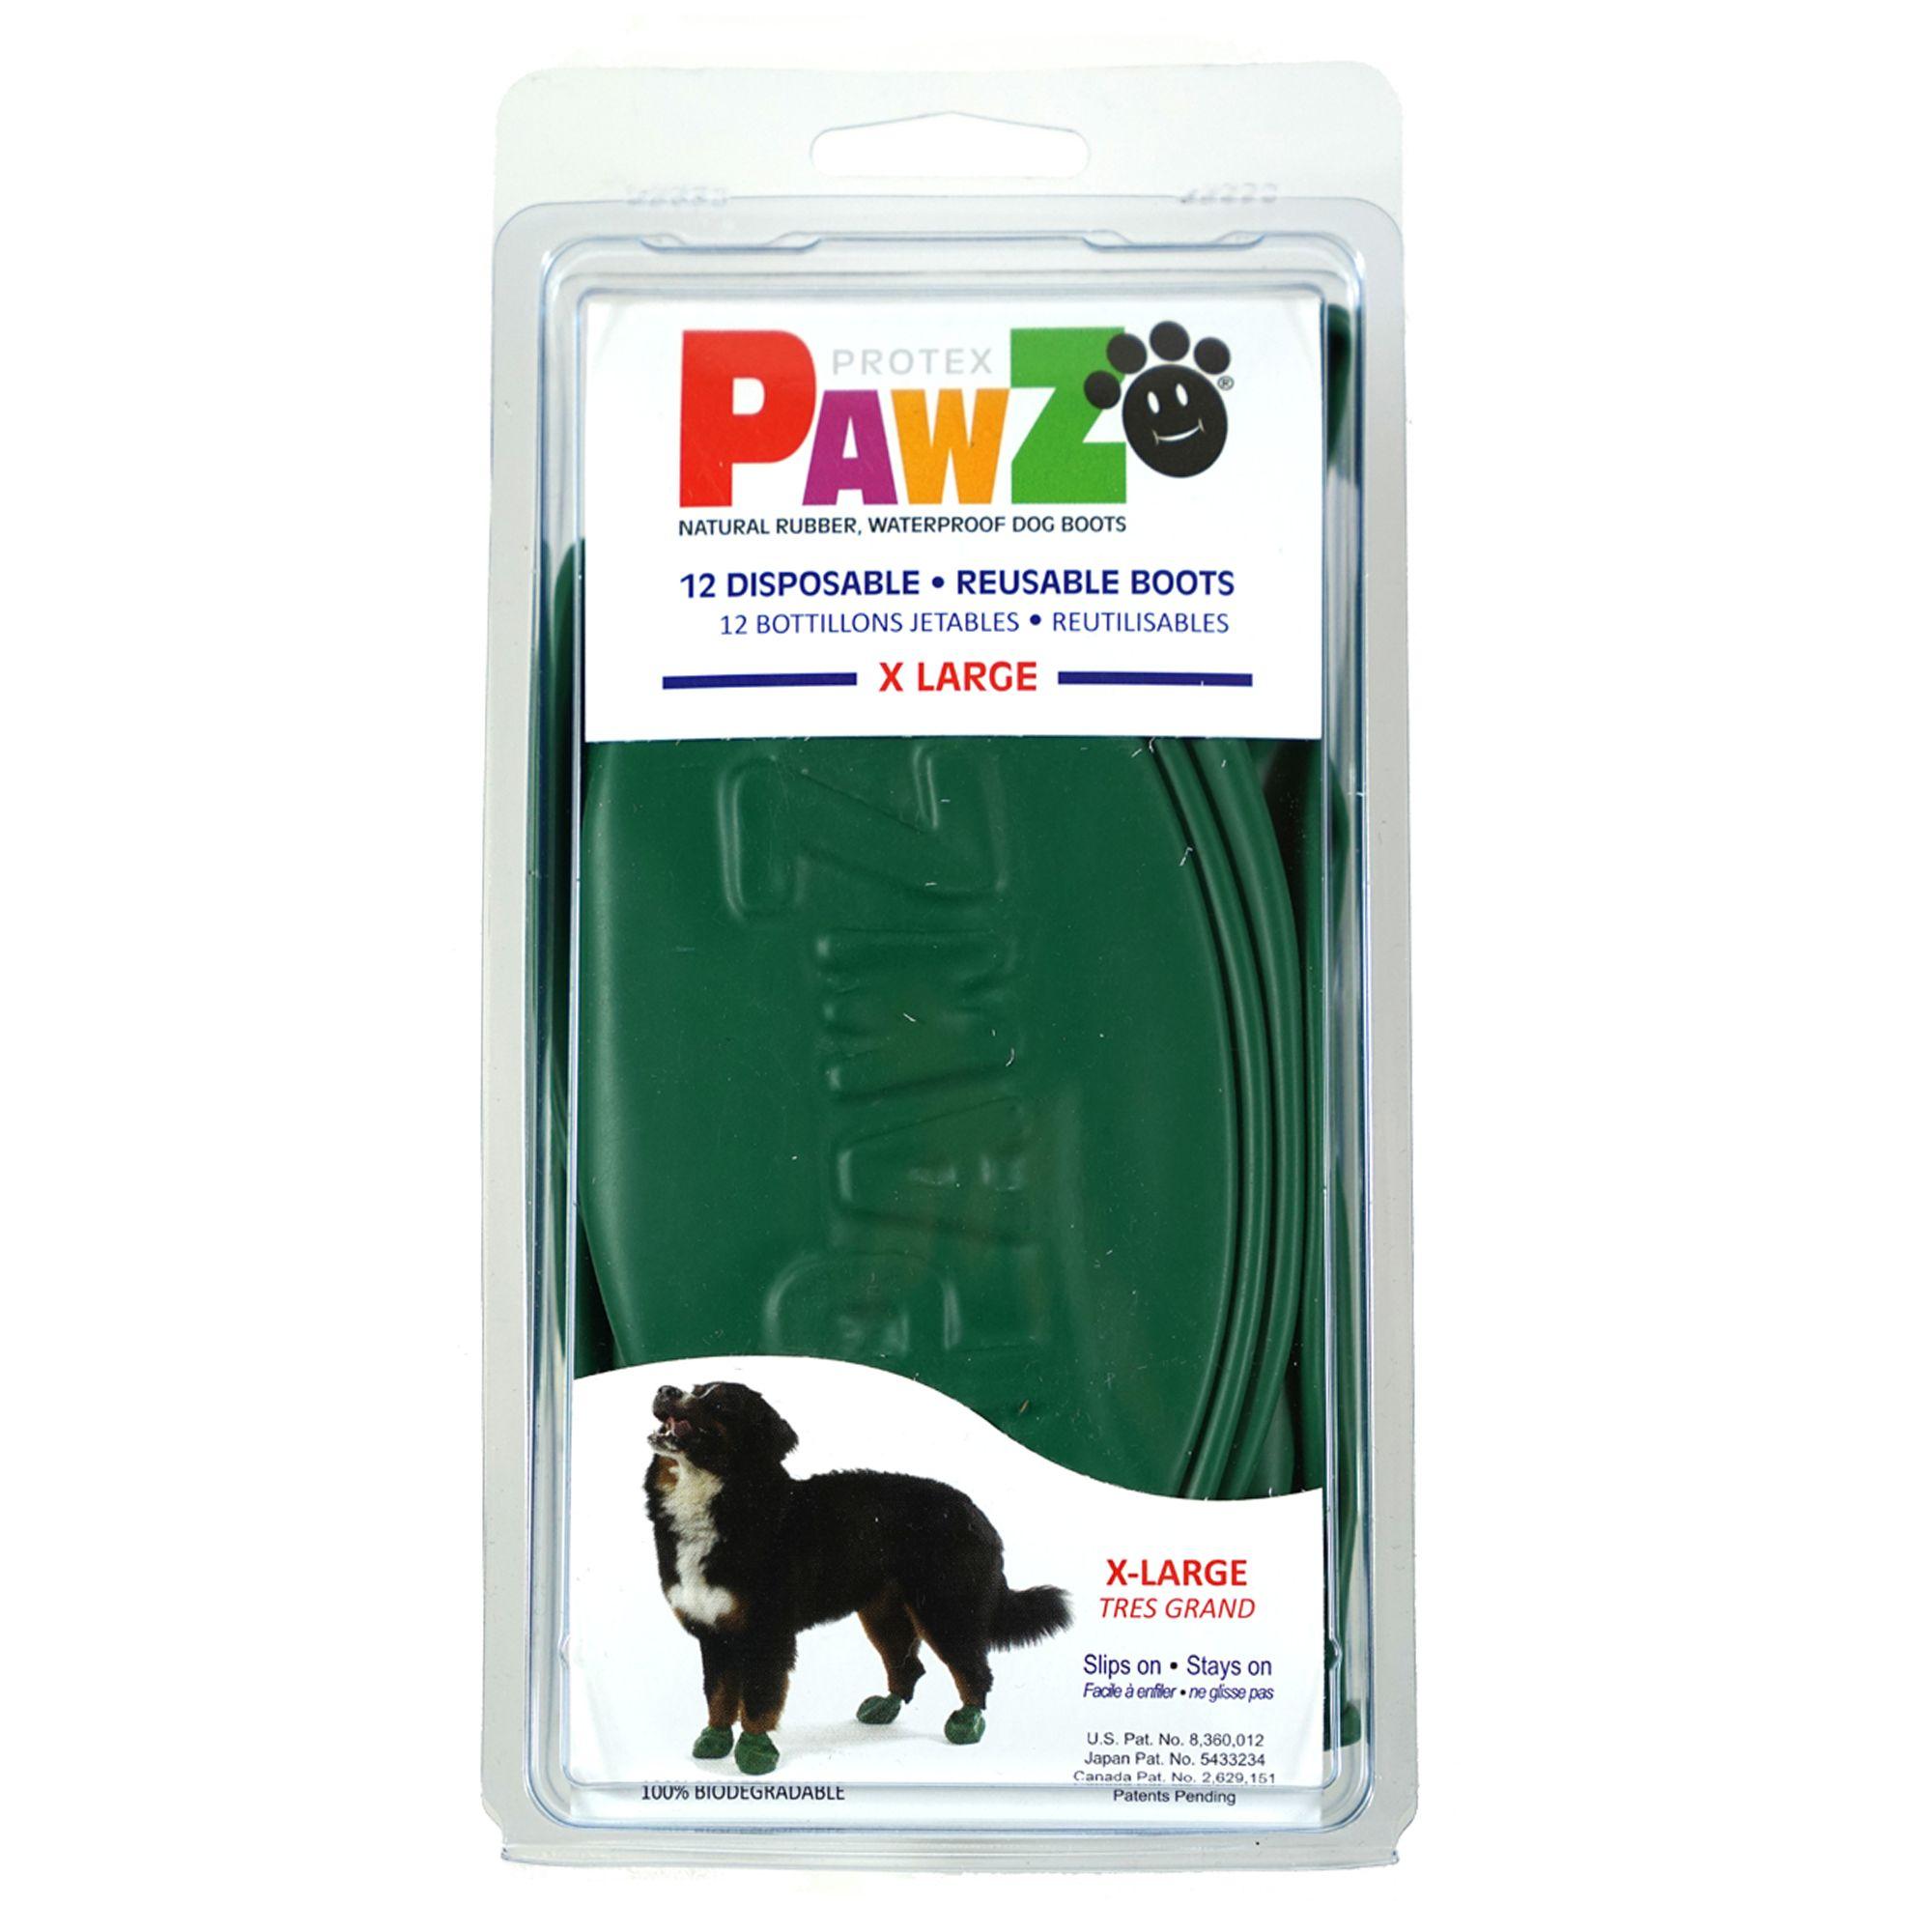 Pawz Waterproof Dog Boots, Blue, Medium